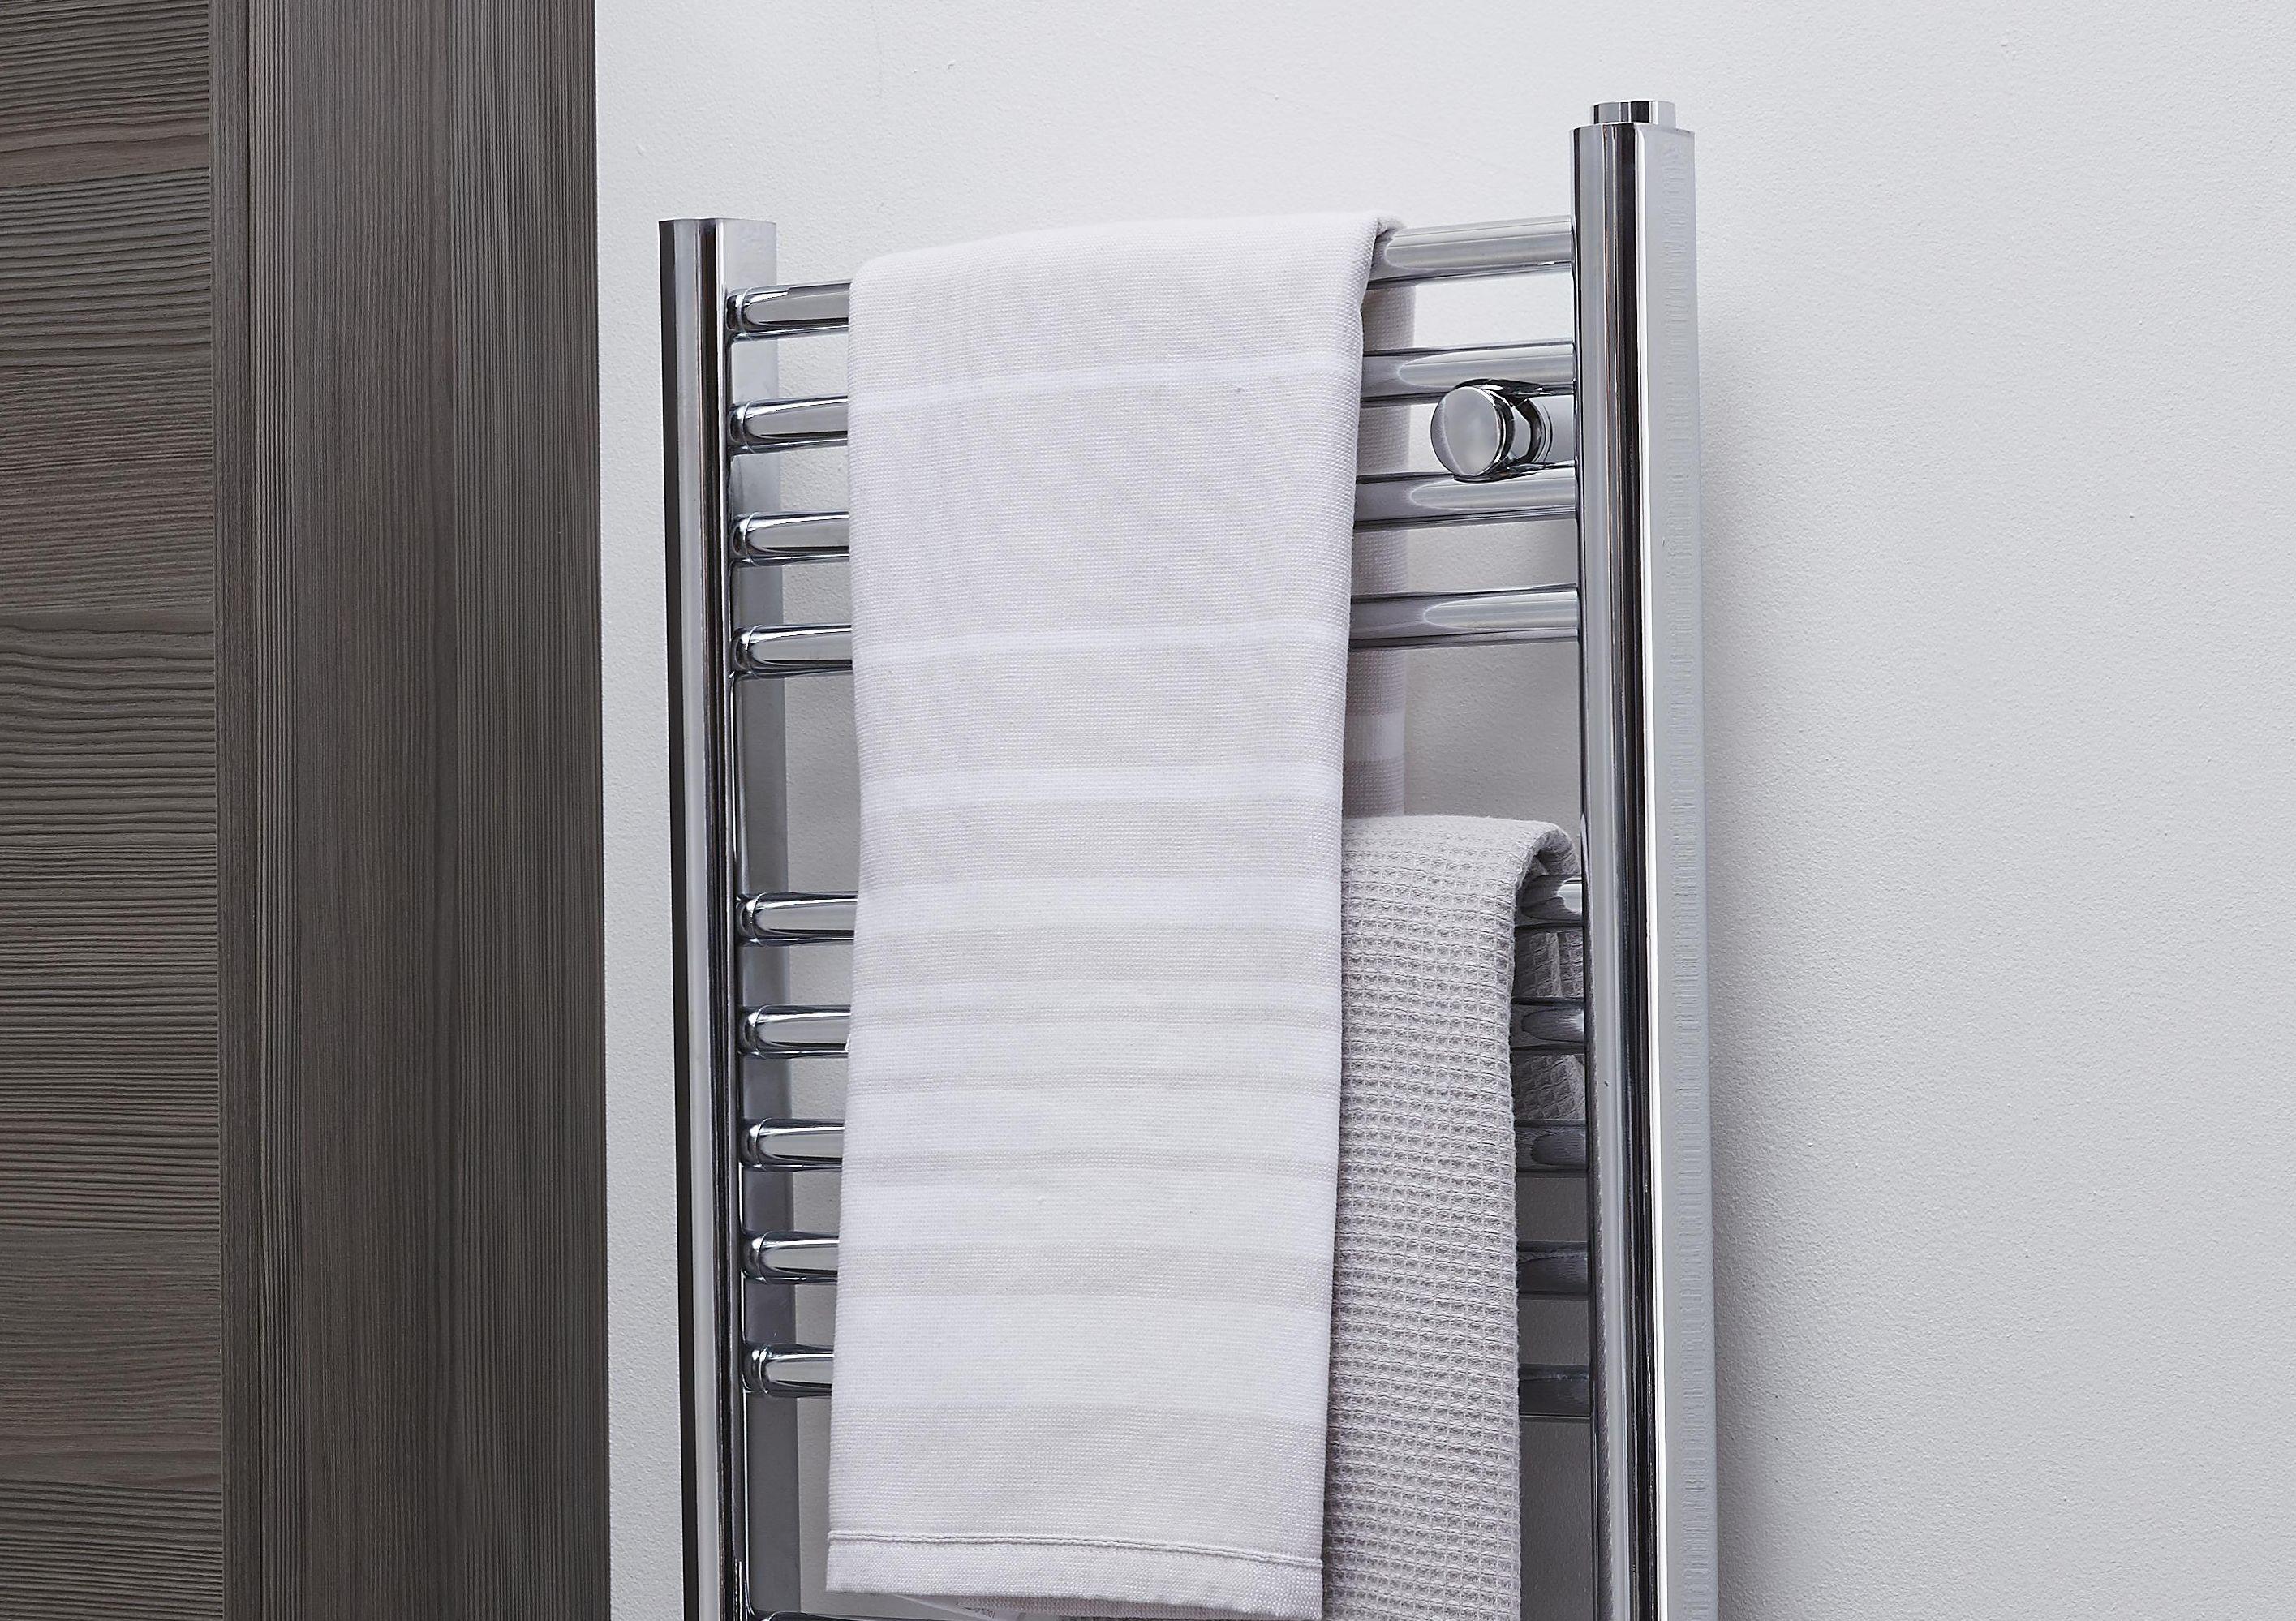 Bathroom Sinks B And Q bathrooms | bathroom fittings & accessories | diy at b&q